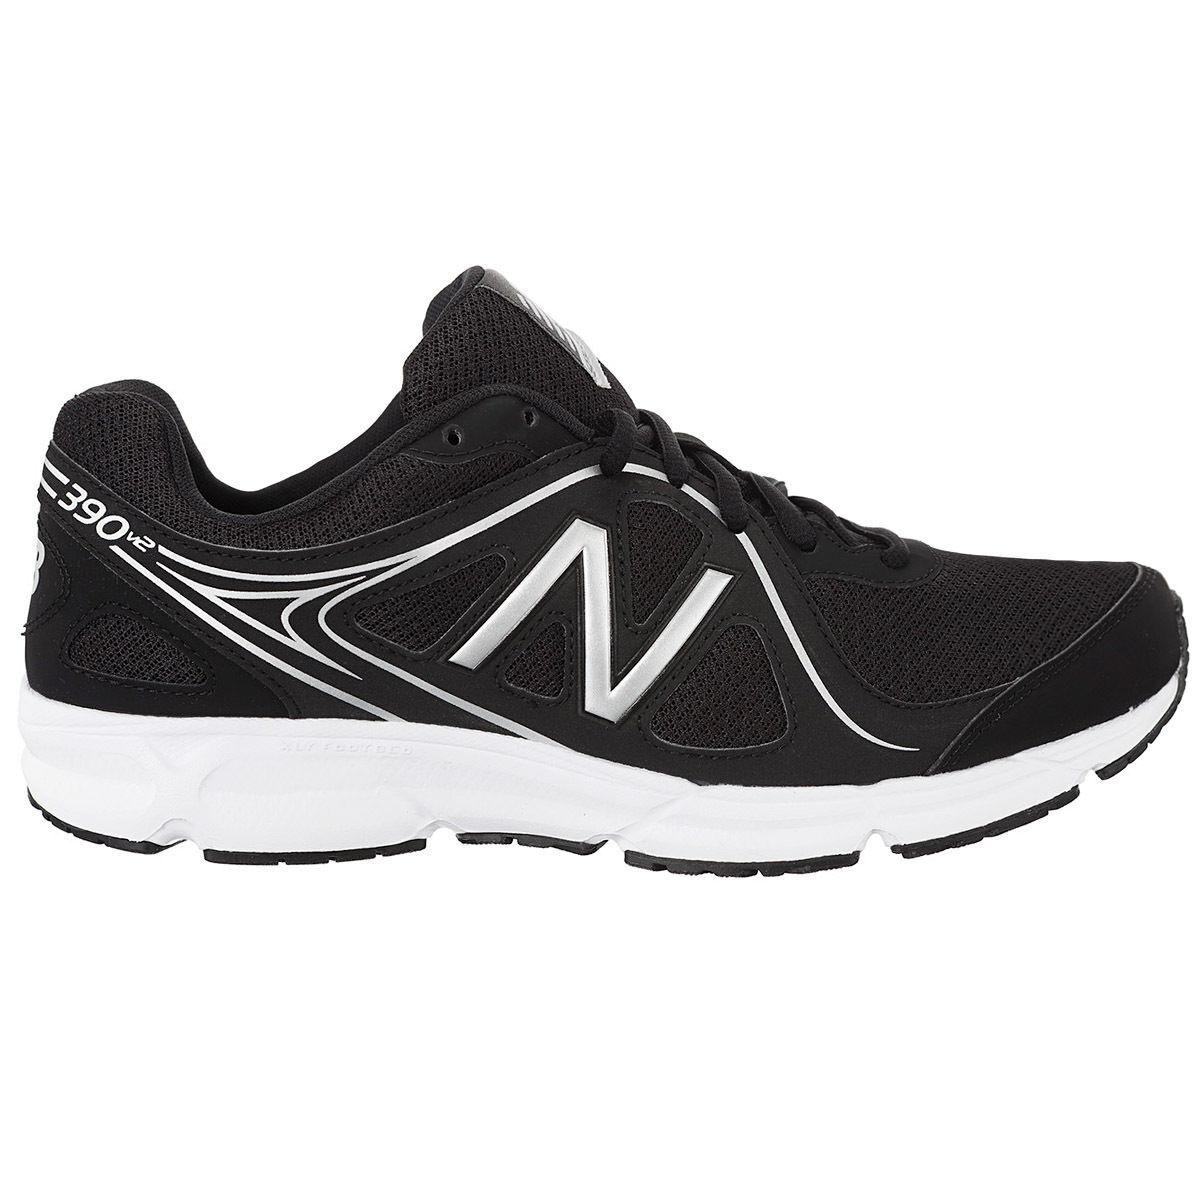 New 390 Uomo Balance NERO Scarpe Sportive Running Scarpe Scarpe Scarpe da ginnastica () (M390BW2 larghezza 4E) f446be